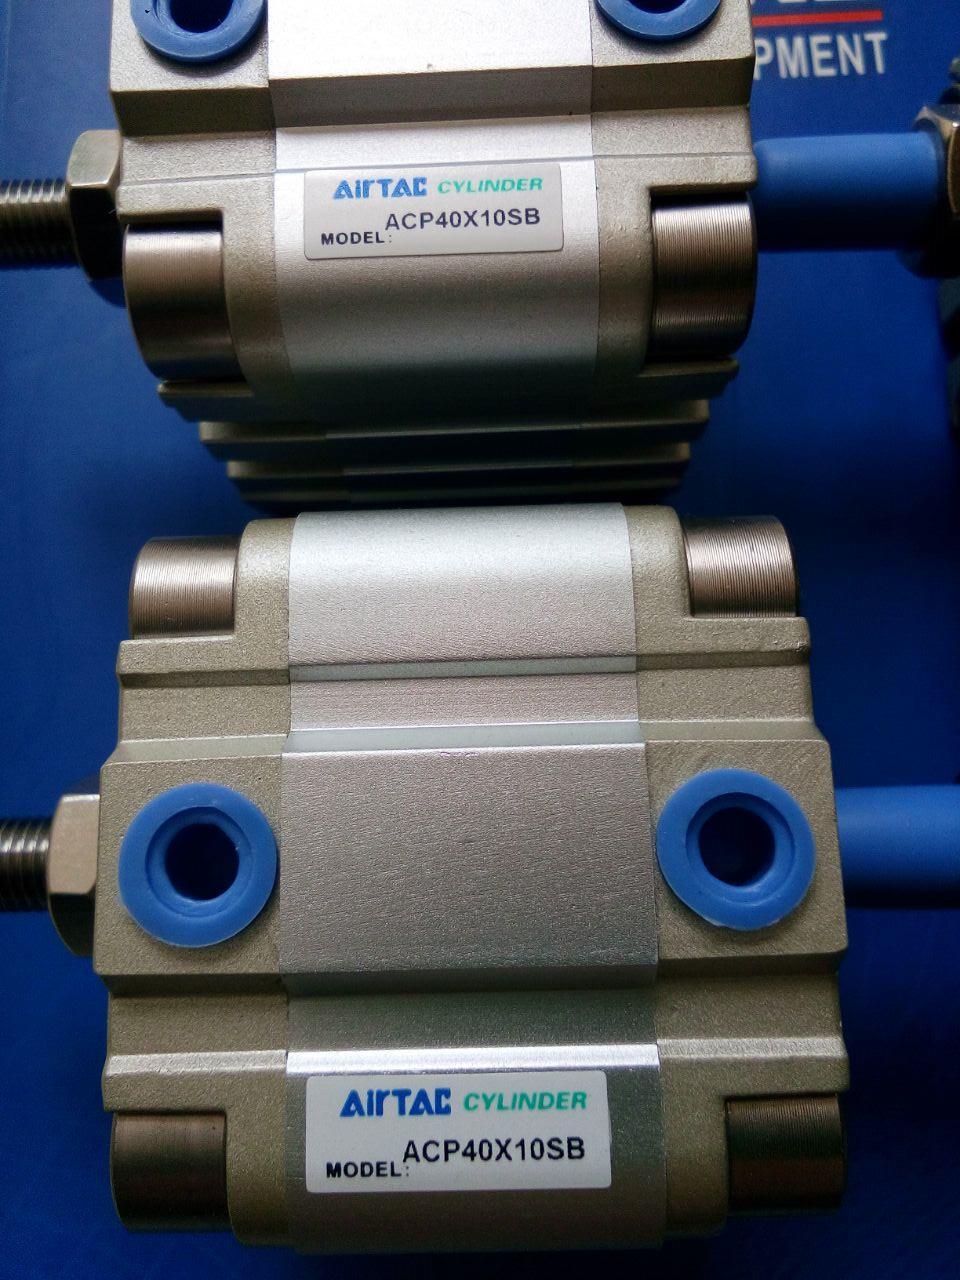 ACP32X5X10X20X30X40X50X60X70X80X90X100X125 sur le cylindre